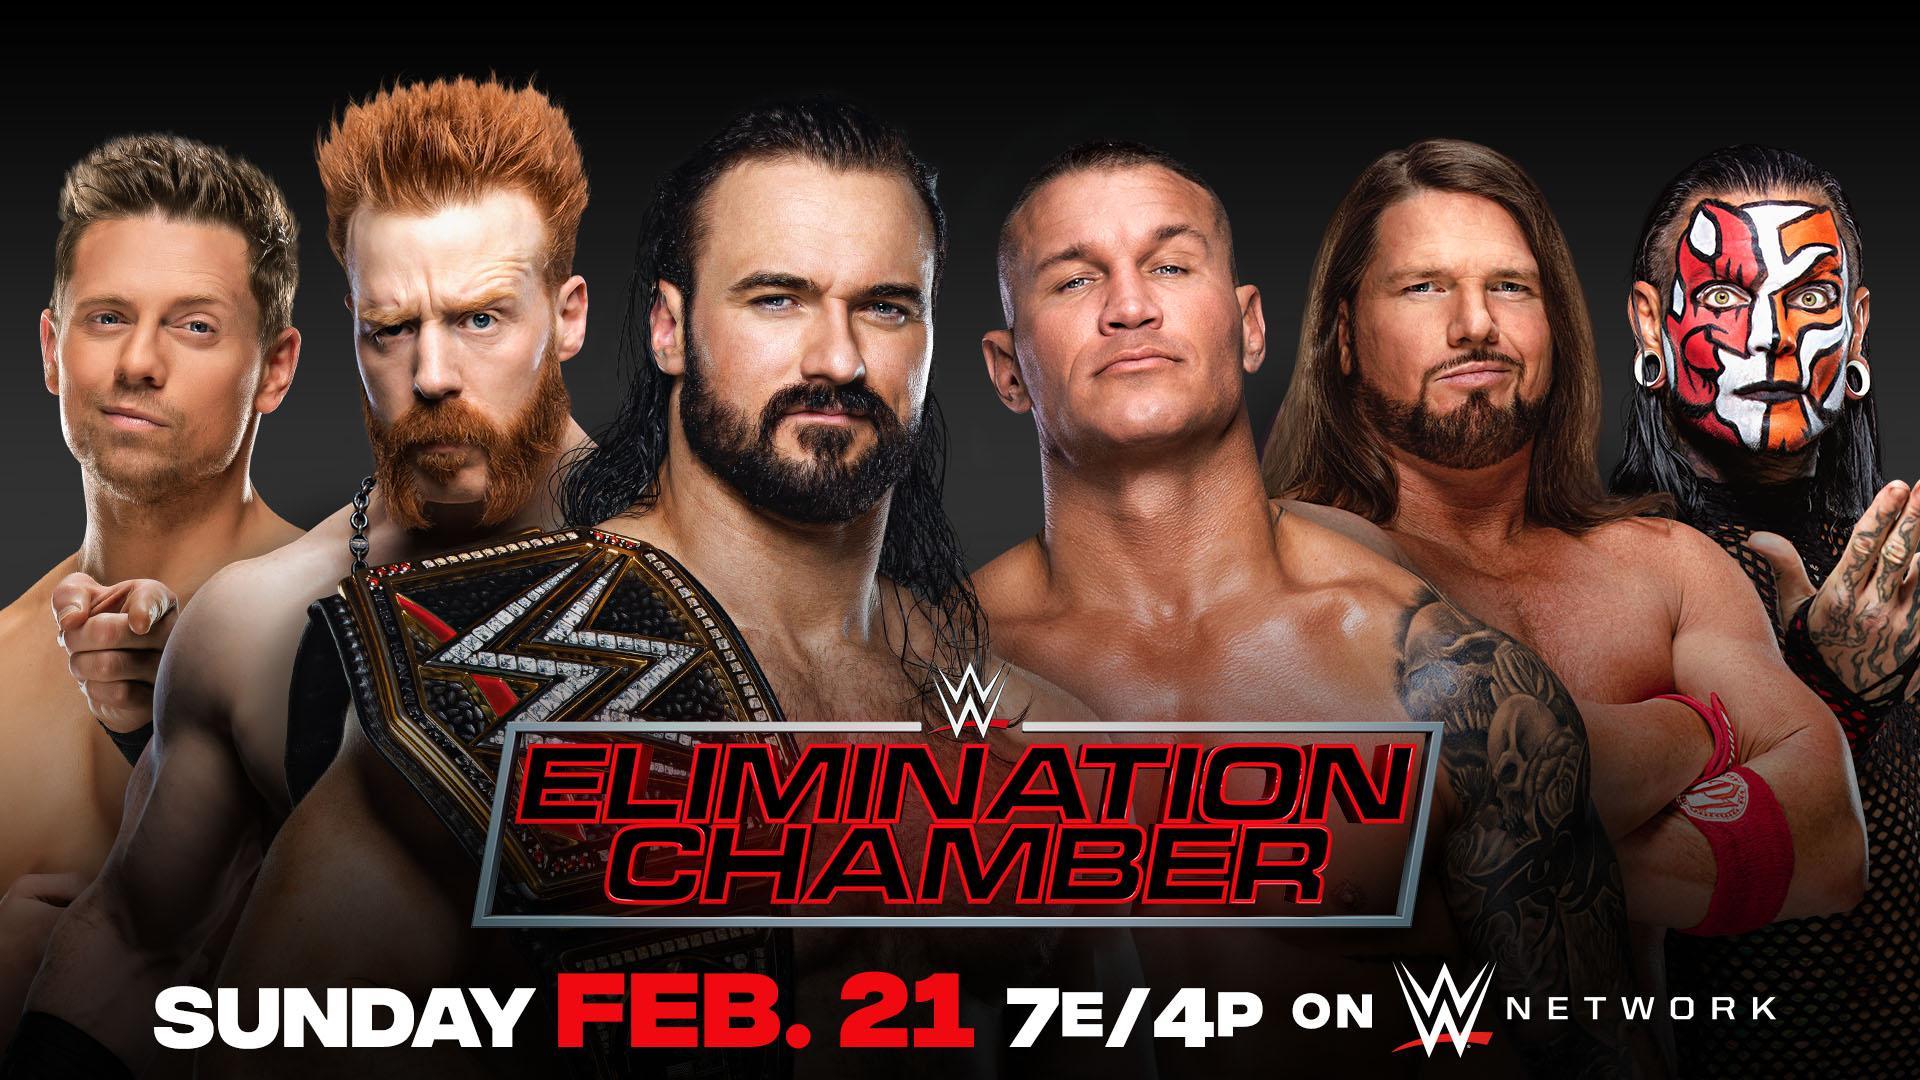 Drew McIntyre defenderá o WWE Championship contra cinco lutadores no Elimination Chamber